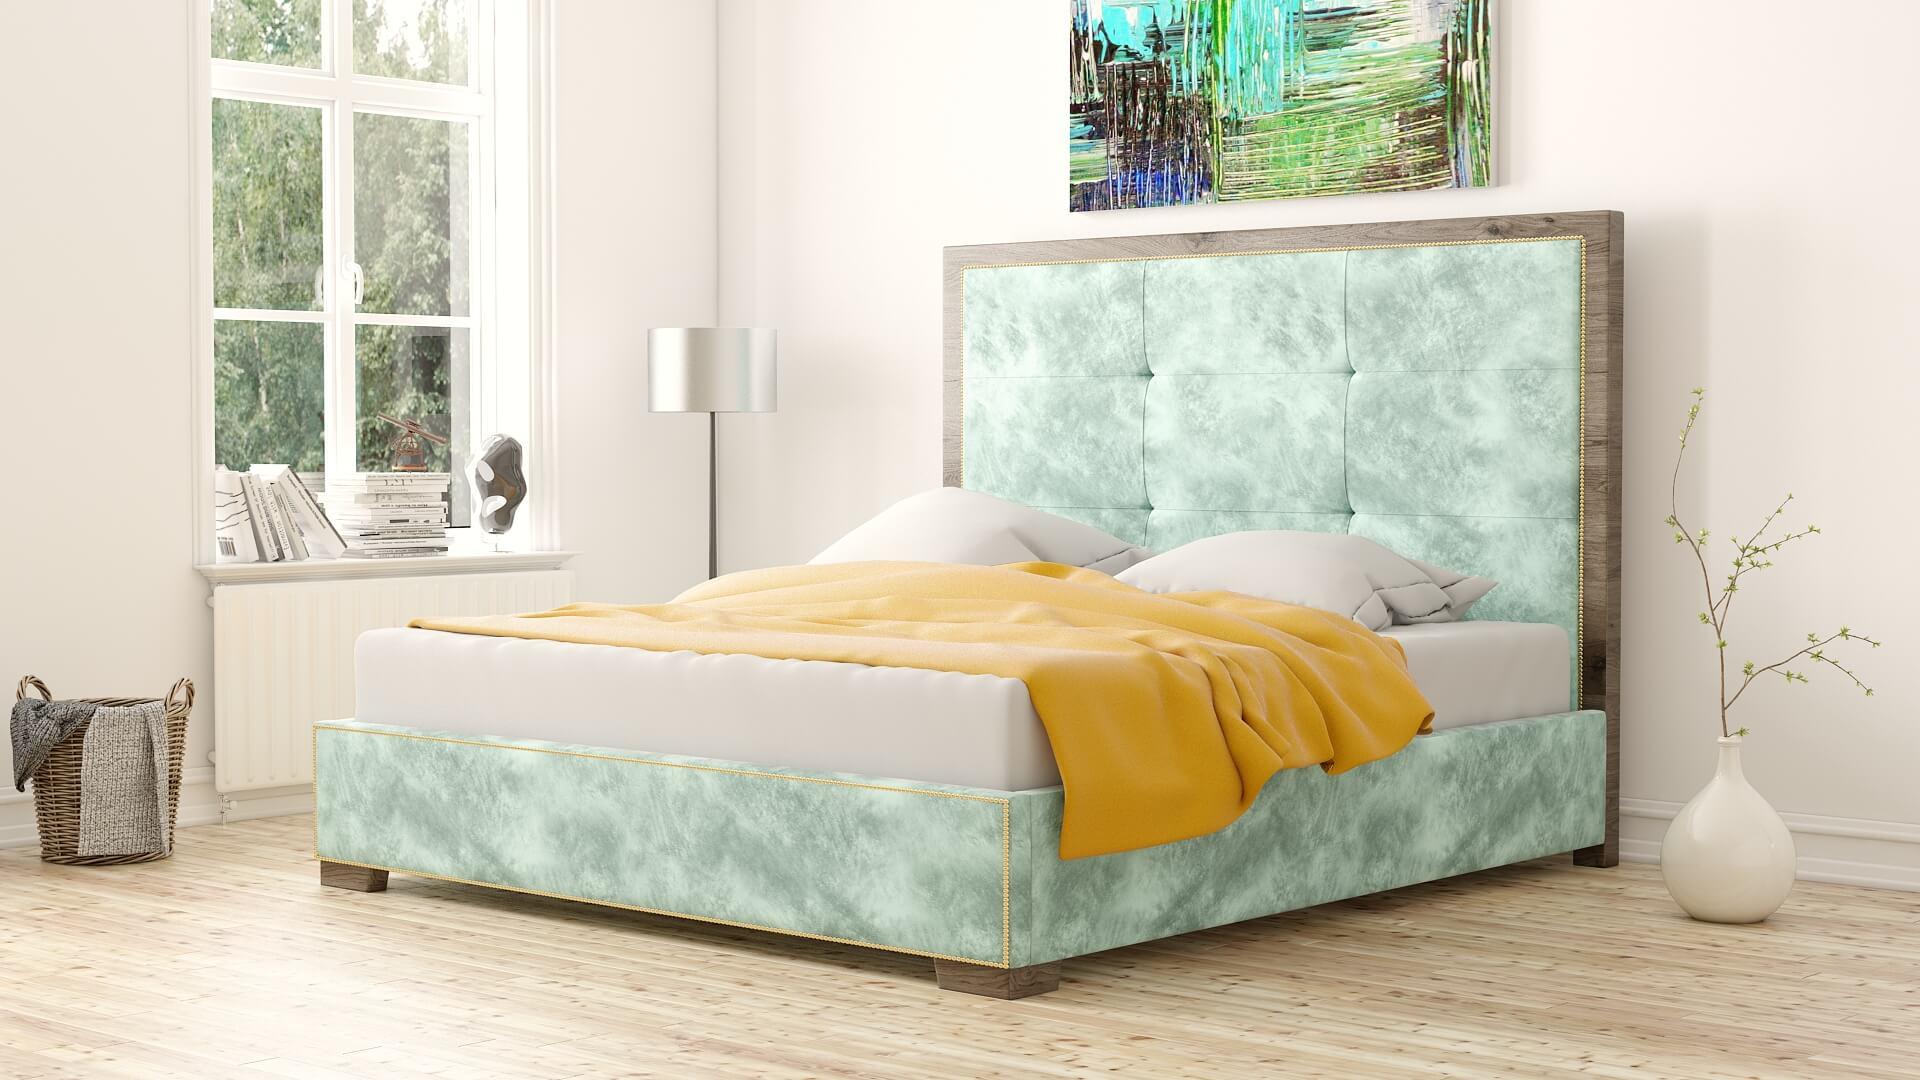 talia bed furniture gallery 3